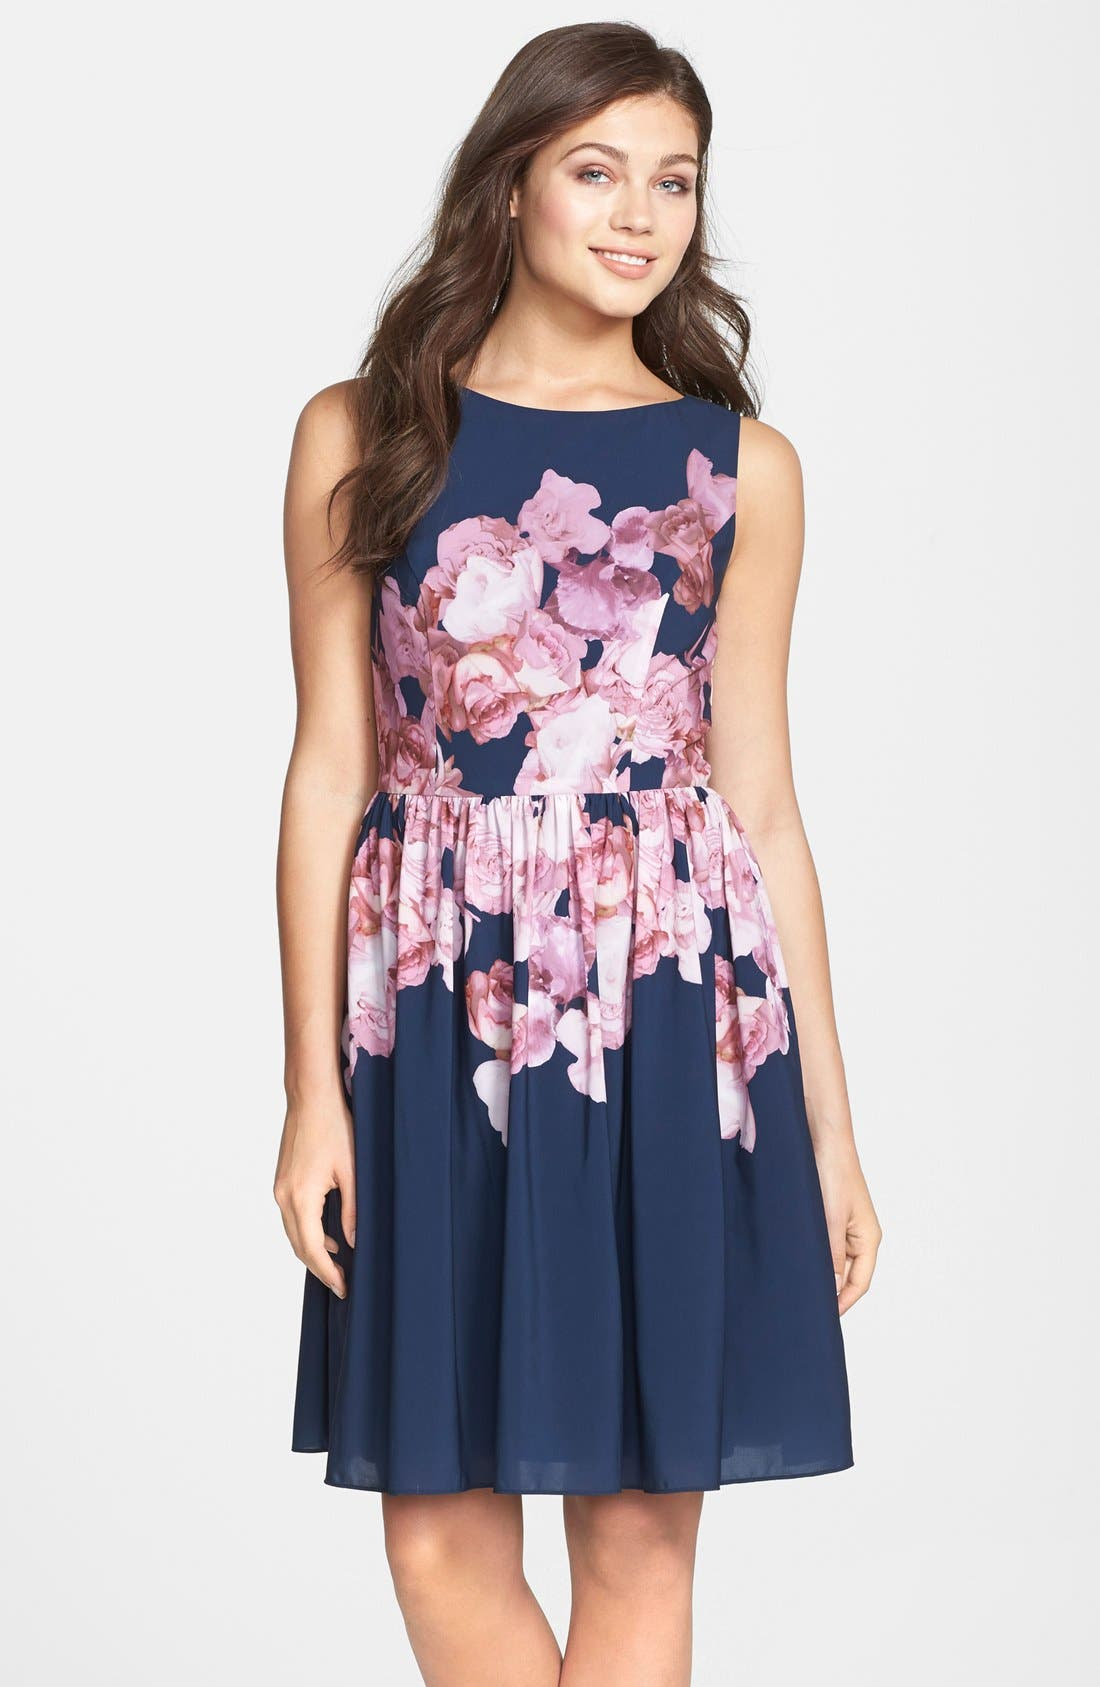 Main Image - Adrianna Papell Floral Print Chiffon Fit & Flare Dress (Regular & Petite)